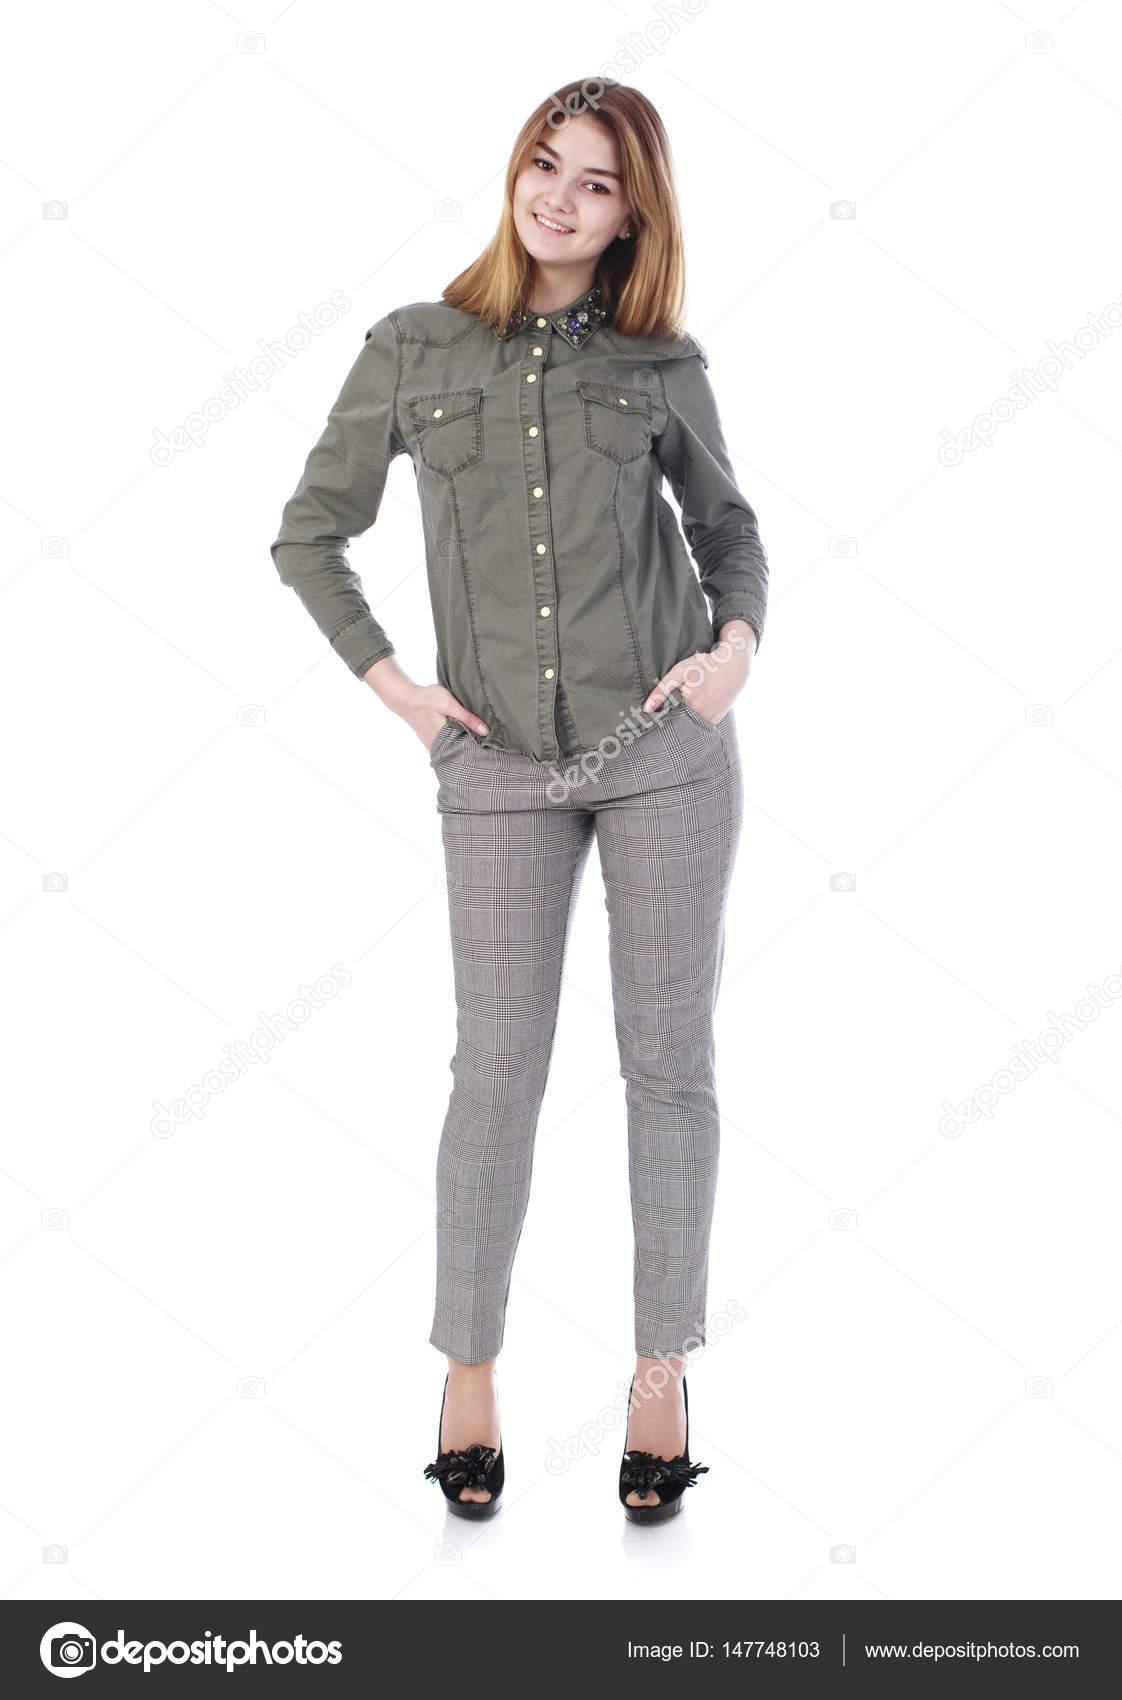 Junge Schöne Blonde Frau In Graue Hose Stockfoto Arkusha 147748103